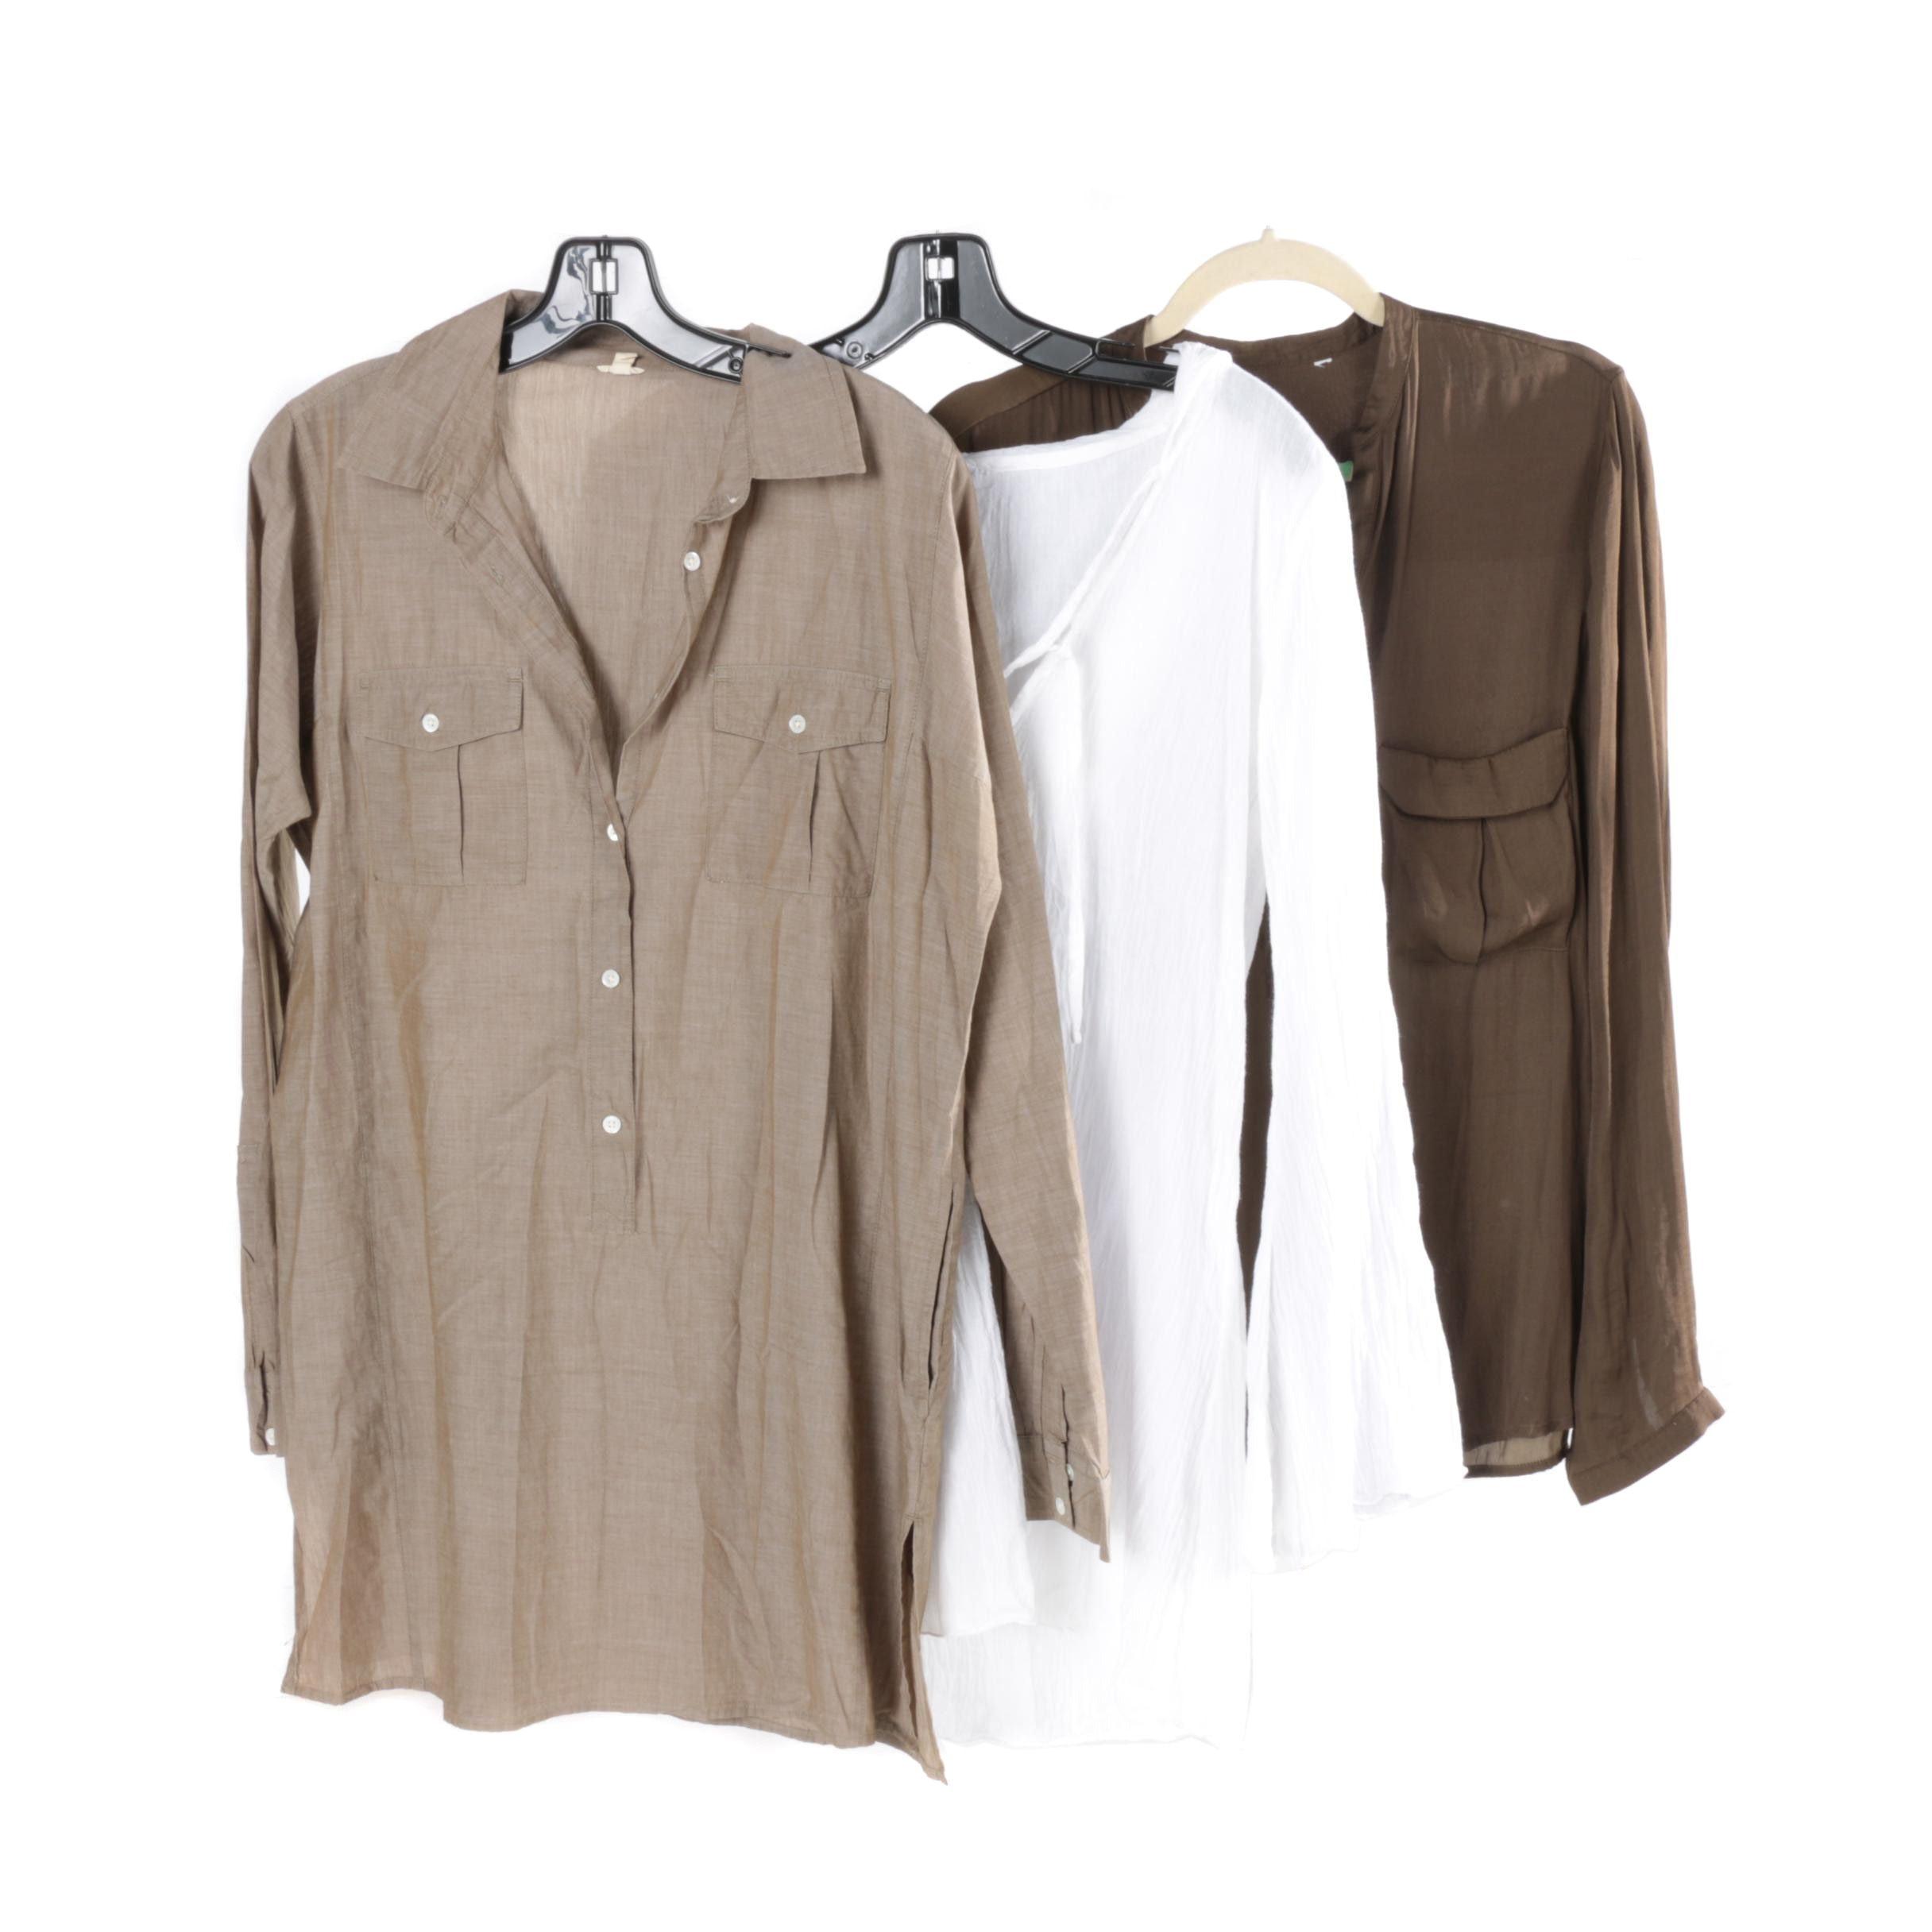 Women's Casual Shirts Including J. Crew